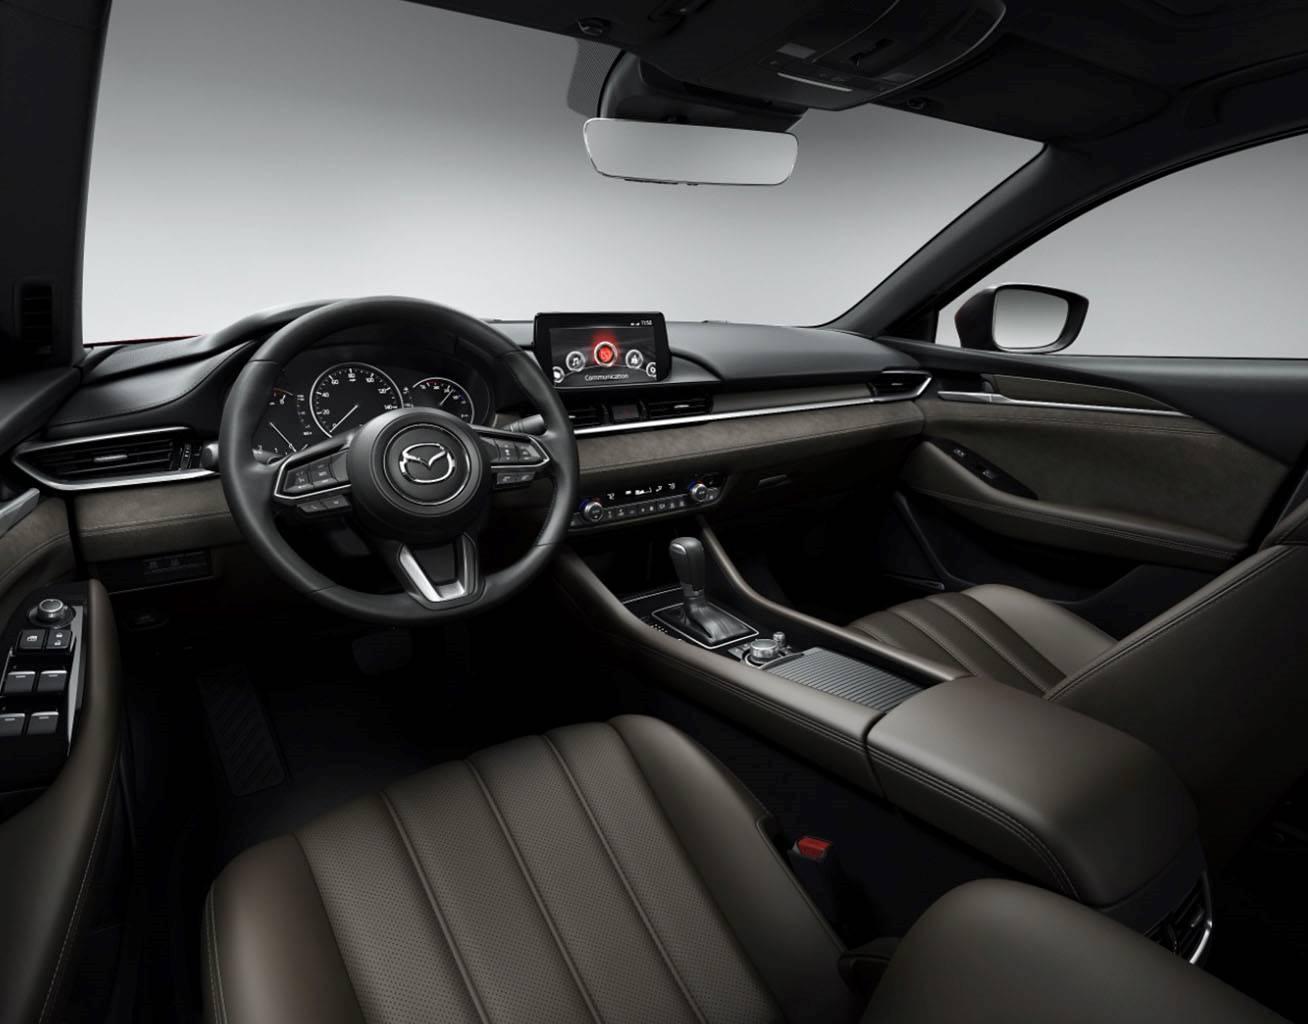 2018 Mazda6, INTERIOR INDULGENCE